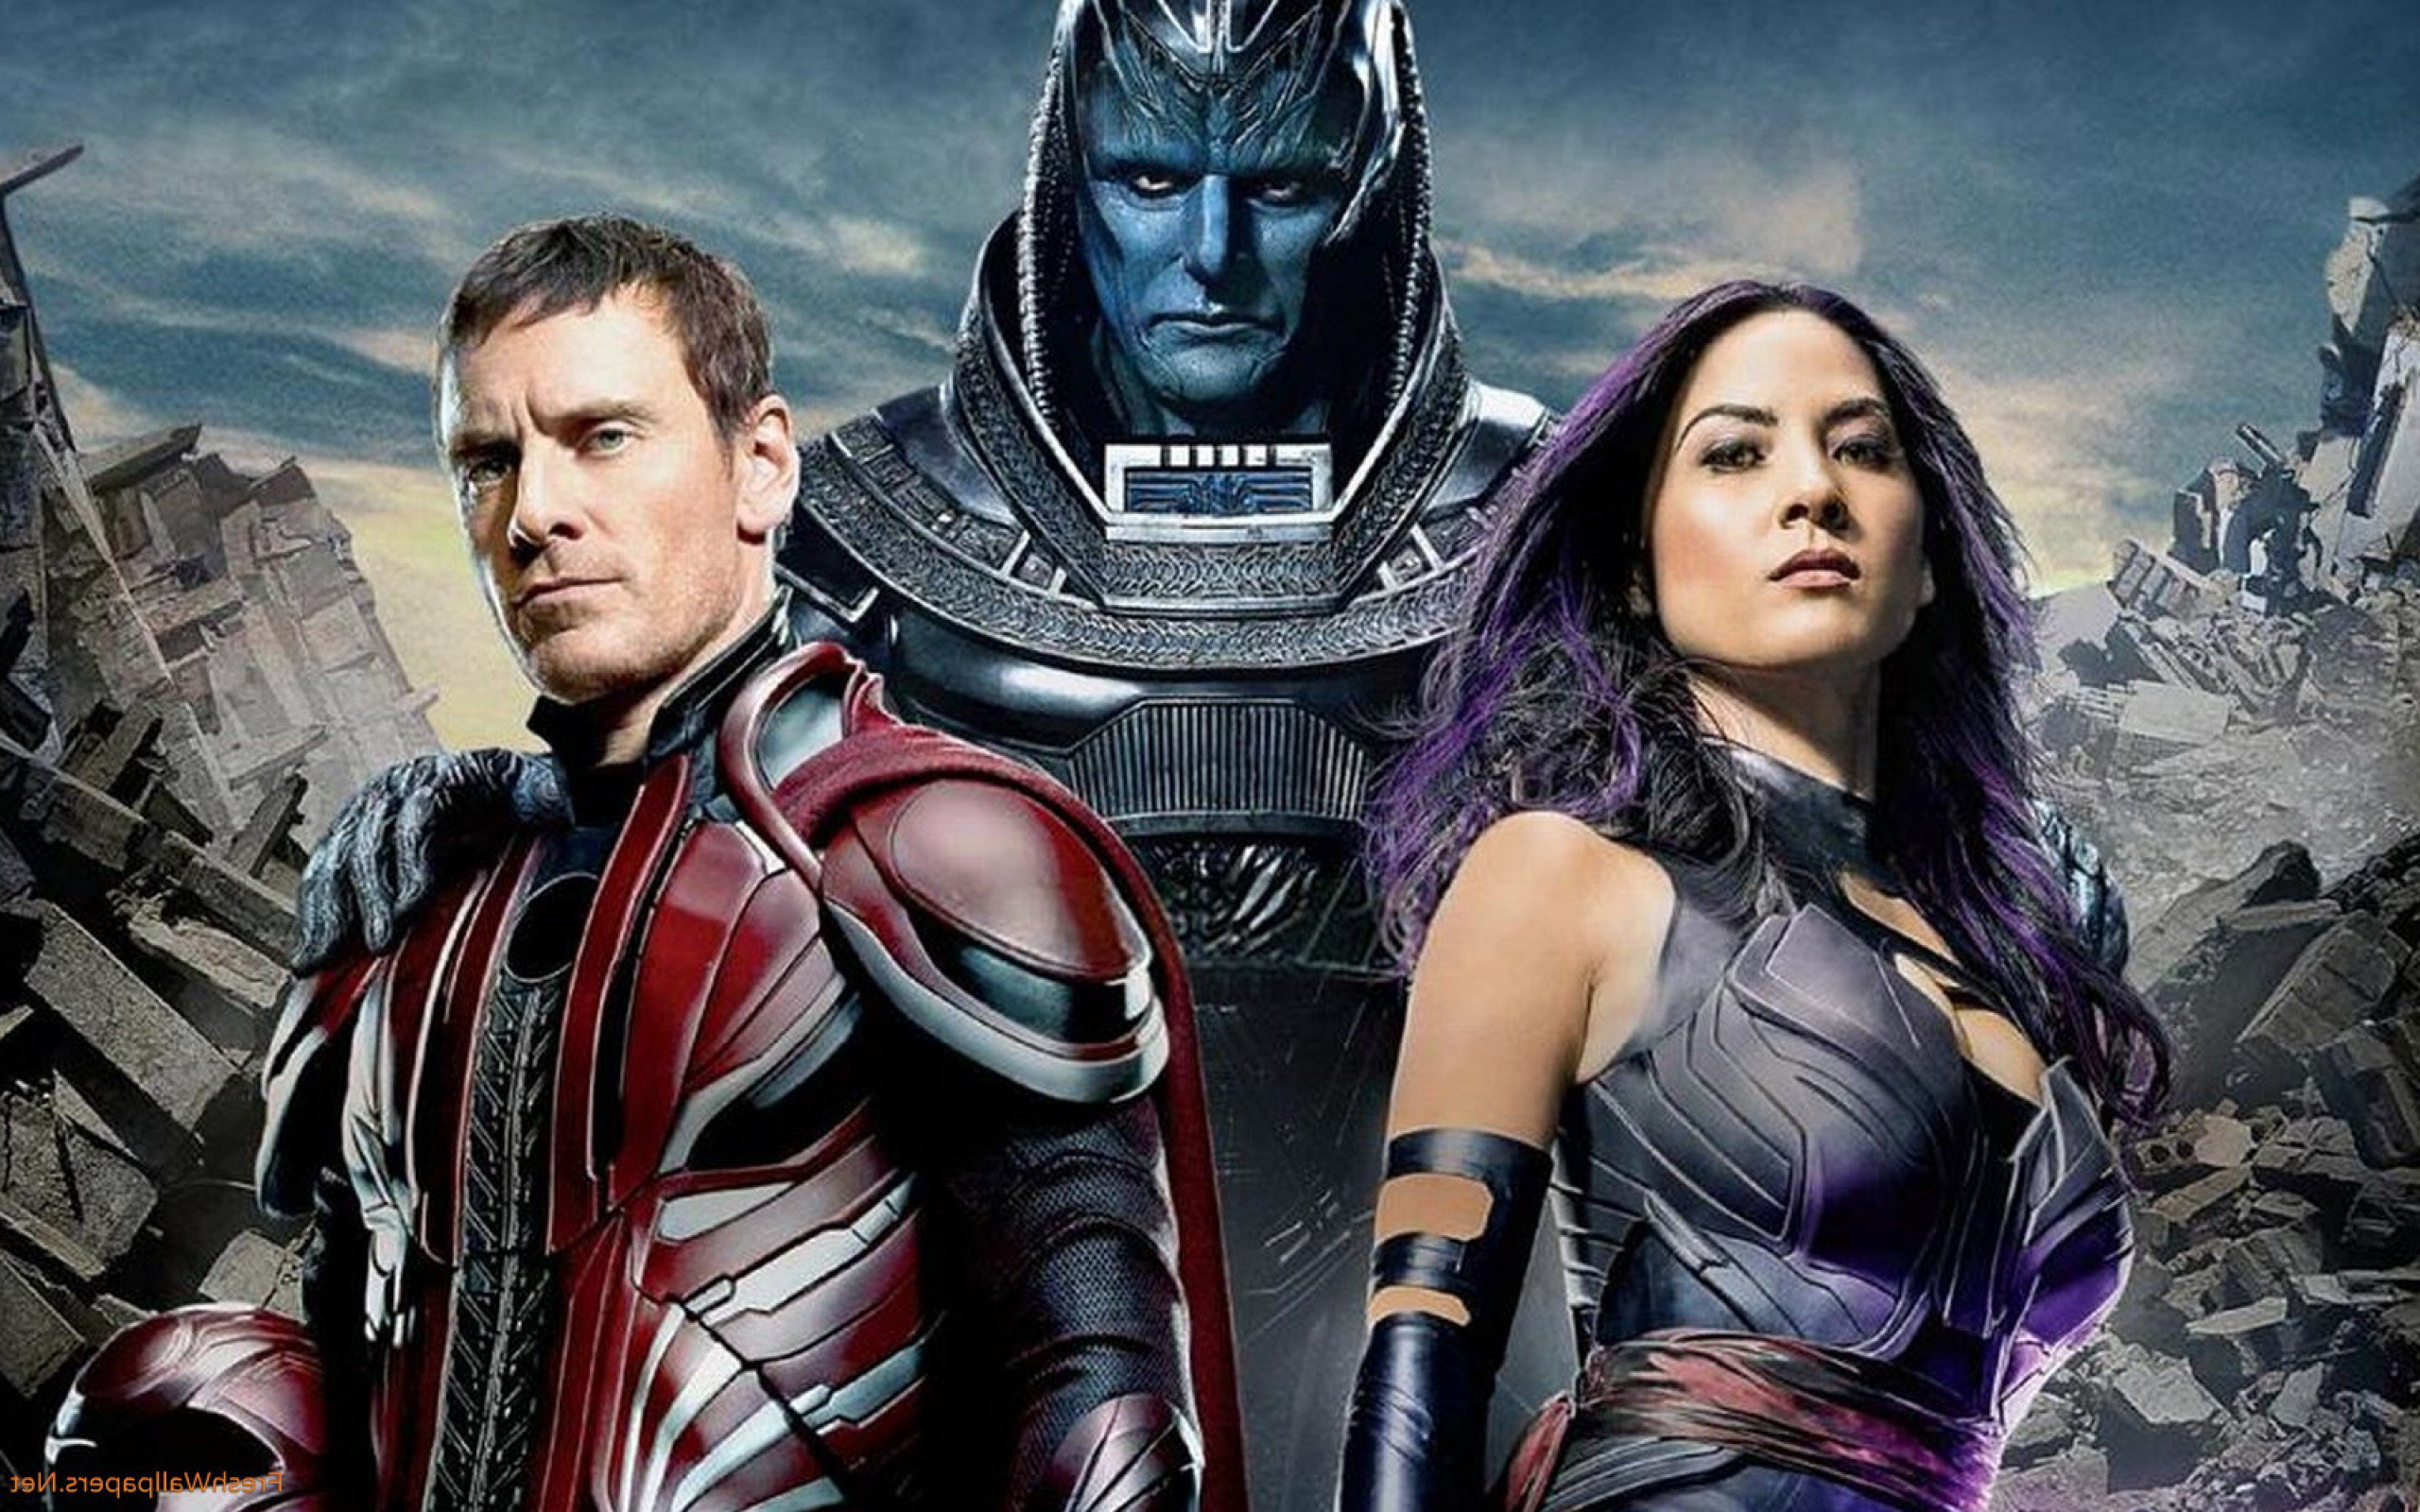 2016 X Men Apocalypse Movie Hd Movies 4k Wallpapers Images